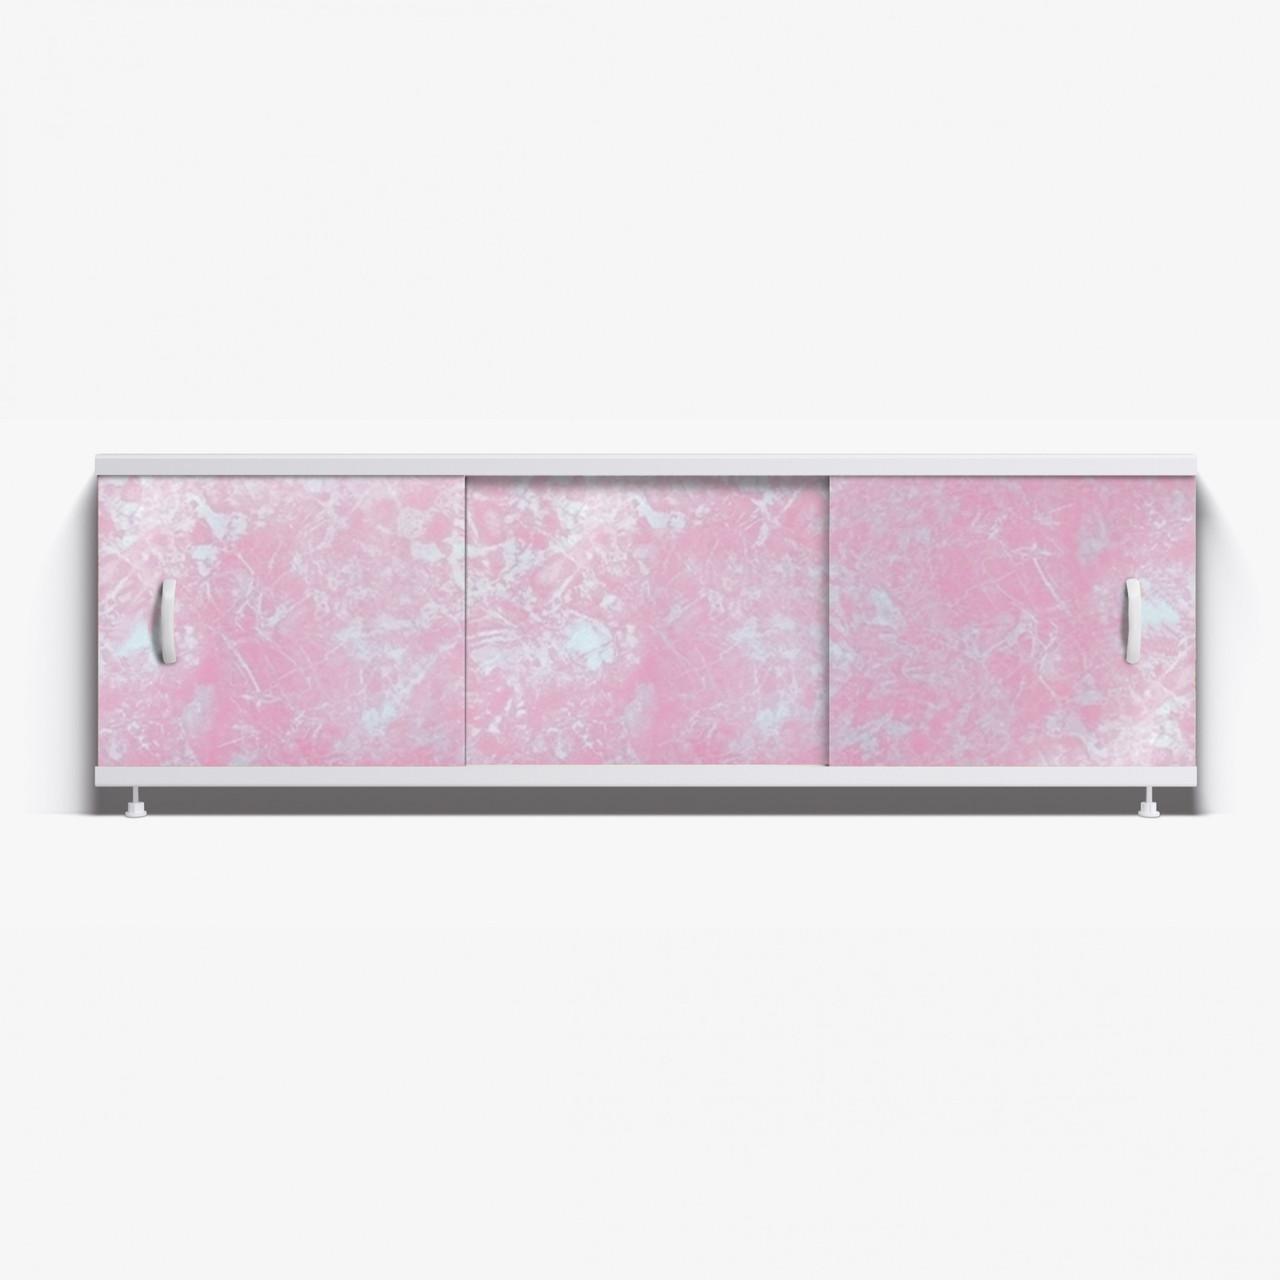 Панель для ванны Alavann ОПТИМА 1.7 м  // 1 светло- розовый мрамор